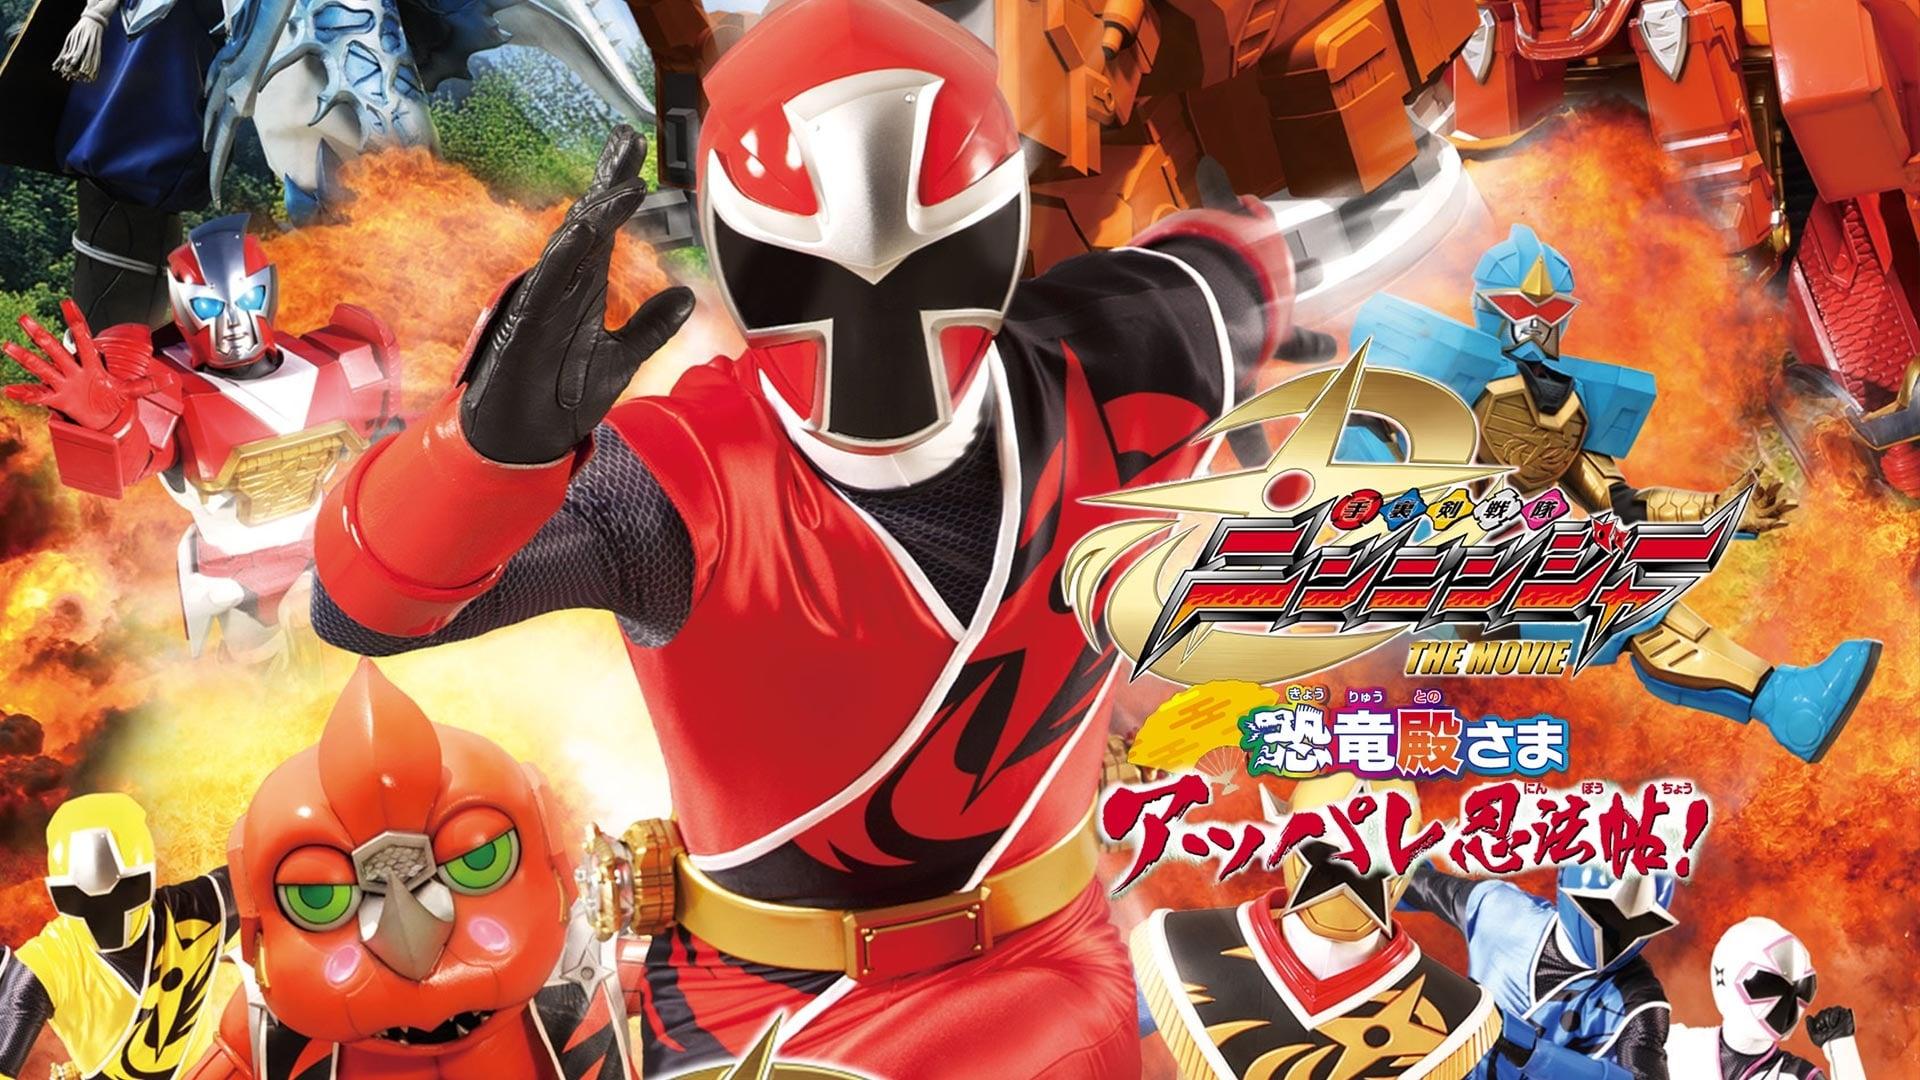 Shuriken Sentai Ninninger The Movie The Dinosaur Lords Splendid Ninja Scroll 2